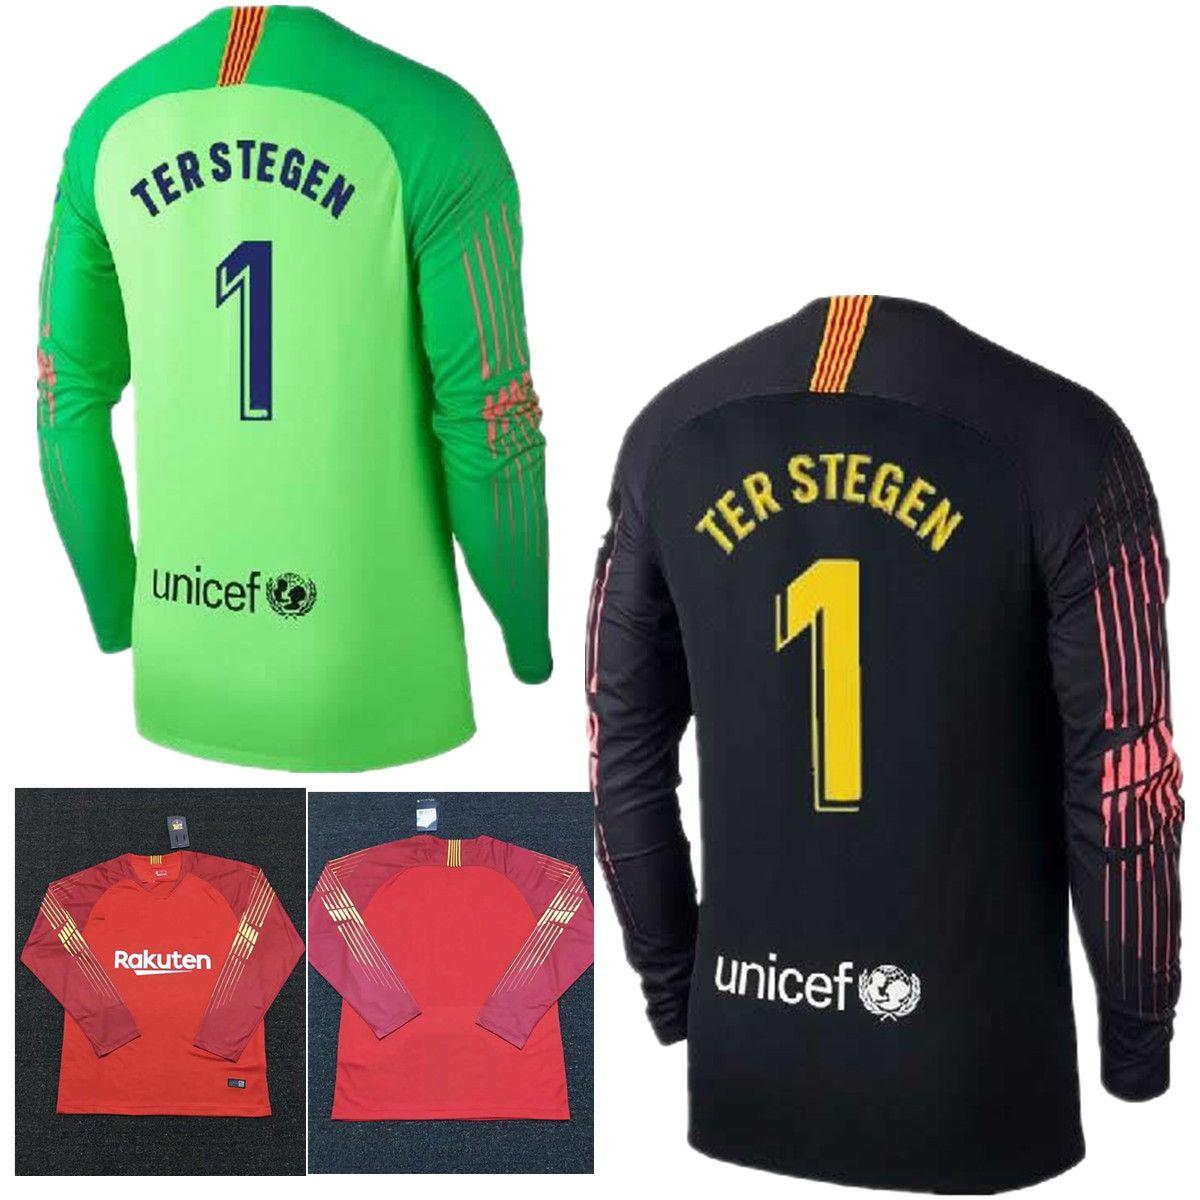 2018 2019 Adultos Camiseta De Fútbol De Manga Larga Ter Stegen Goalkeeper  Jersey   1 Marc Andre Ter Stegen Camiseta De Portero Black Orange Camisetas  De ... a209675d89e